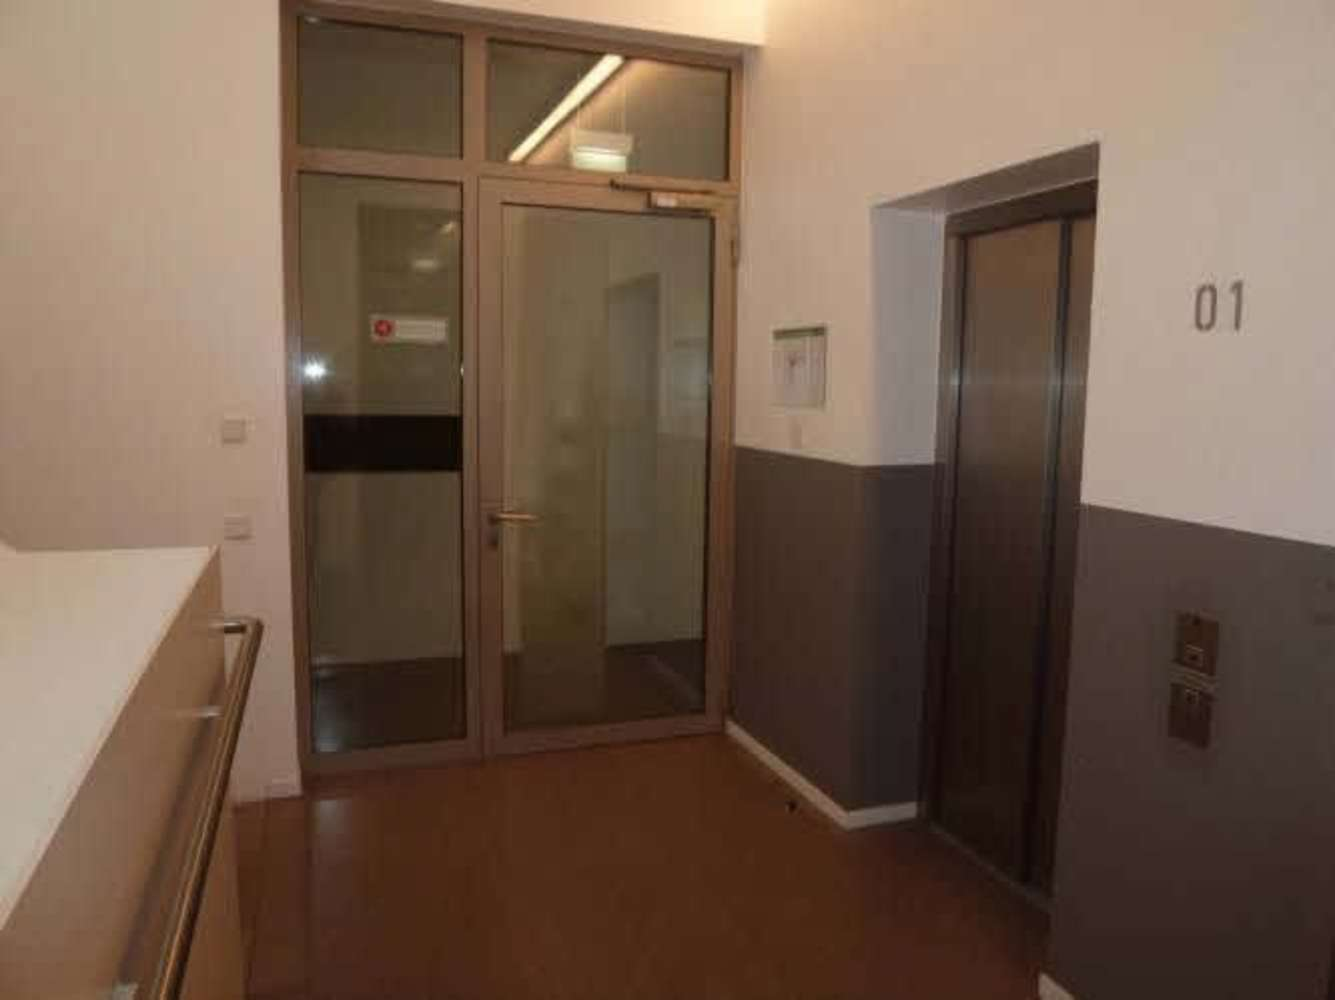 Büros Frankfurt am main, 60314 - Büro - Frankfurt am Main, Ostend - F1313 - 9410750